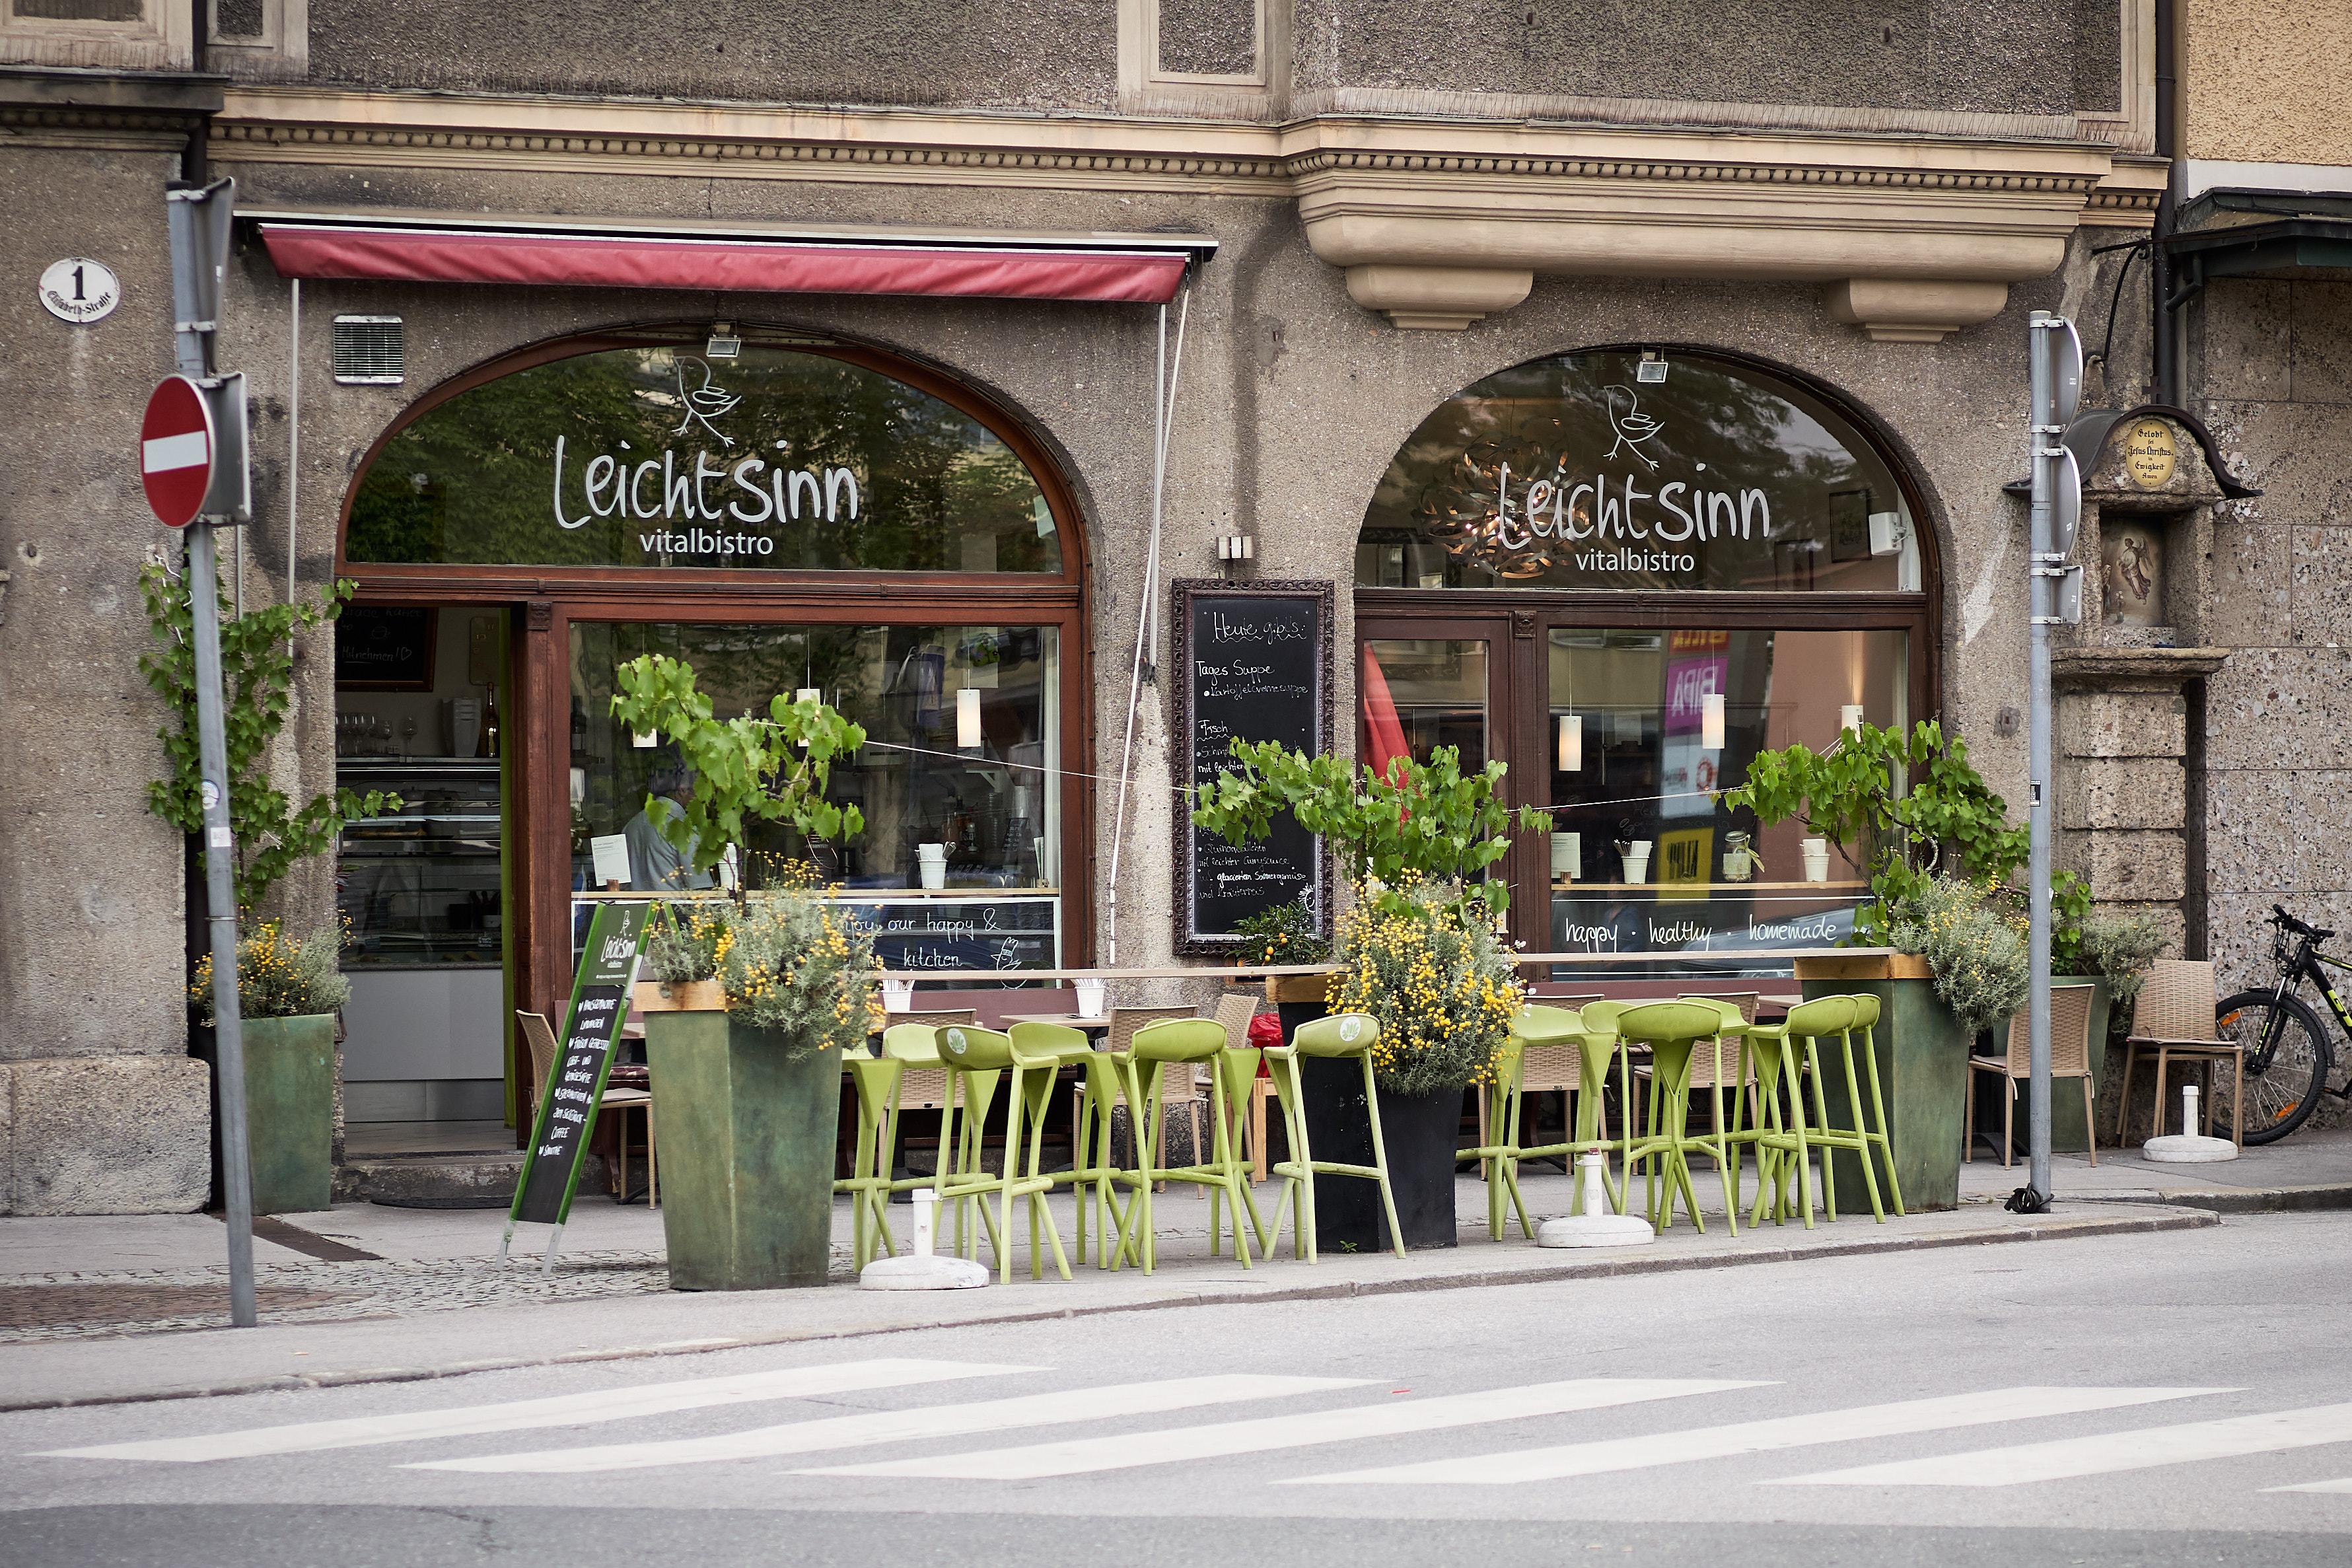 Leichtsinn | feel-good food | Leichtsinn in Salzburg